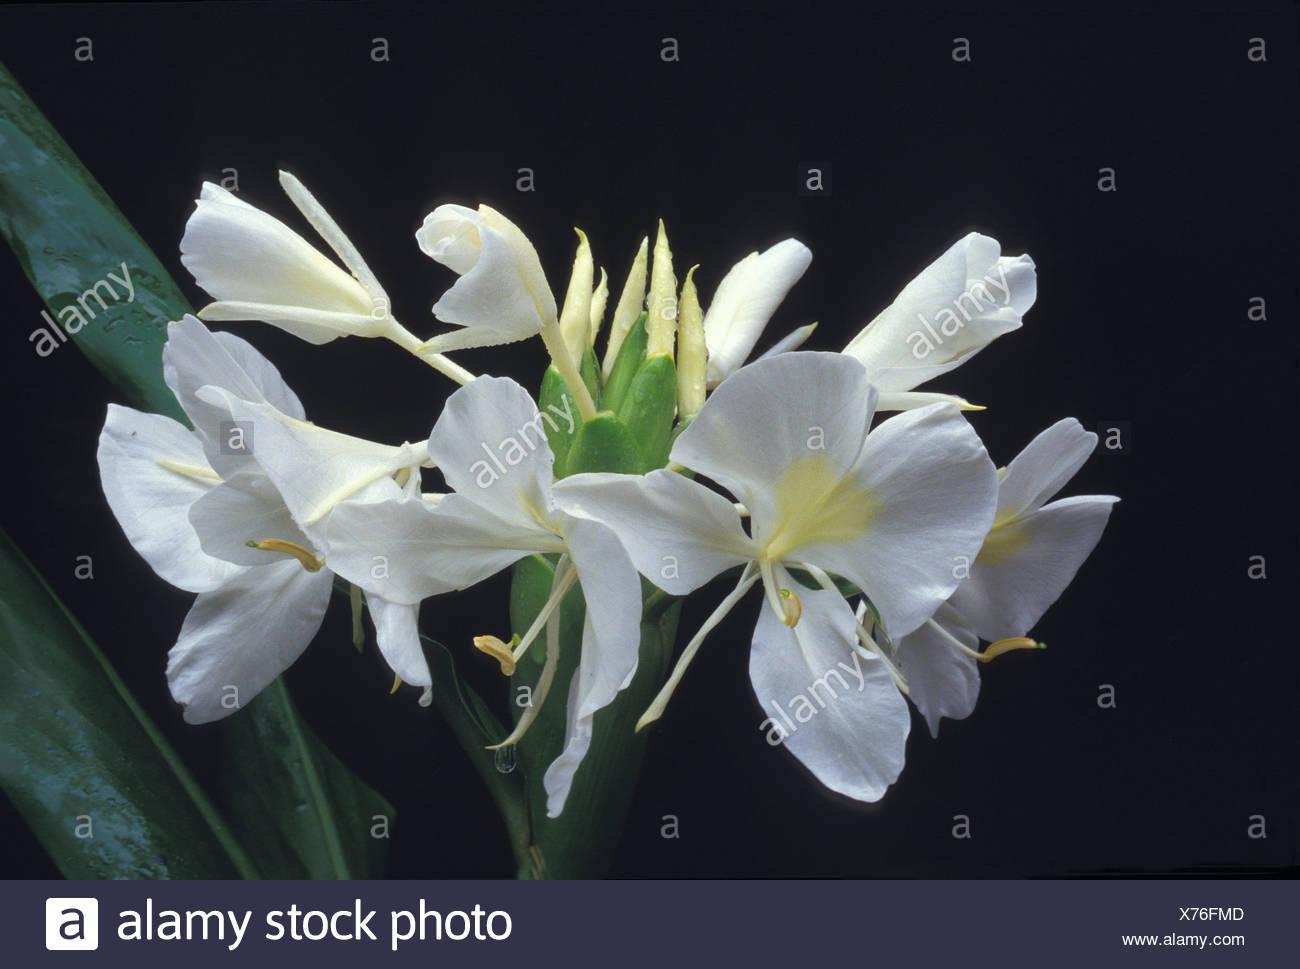 White Ginger Hedychium Coronarium Fragrant Flower Often Used In